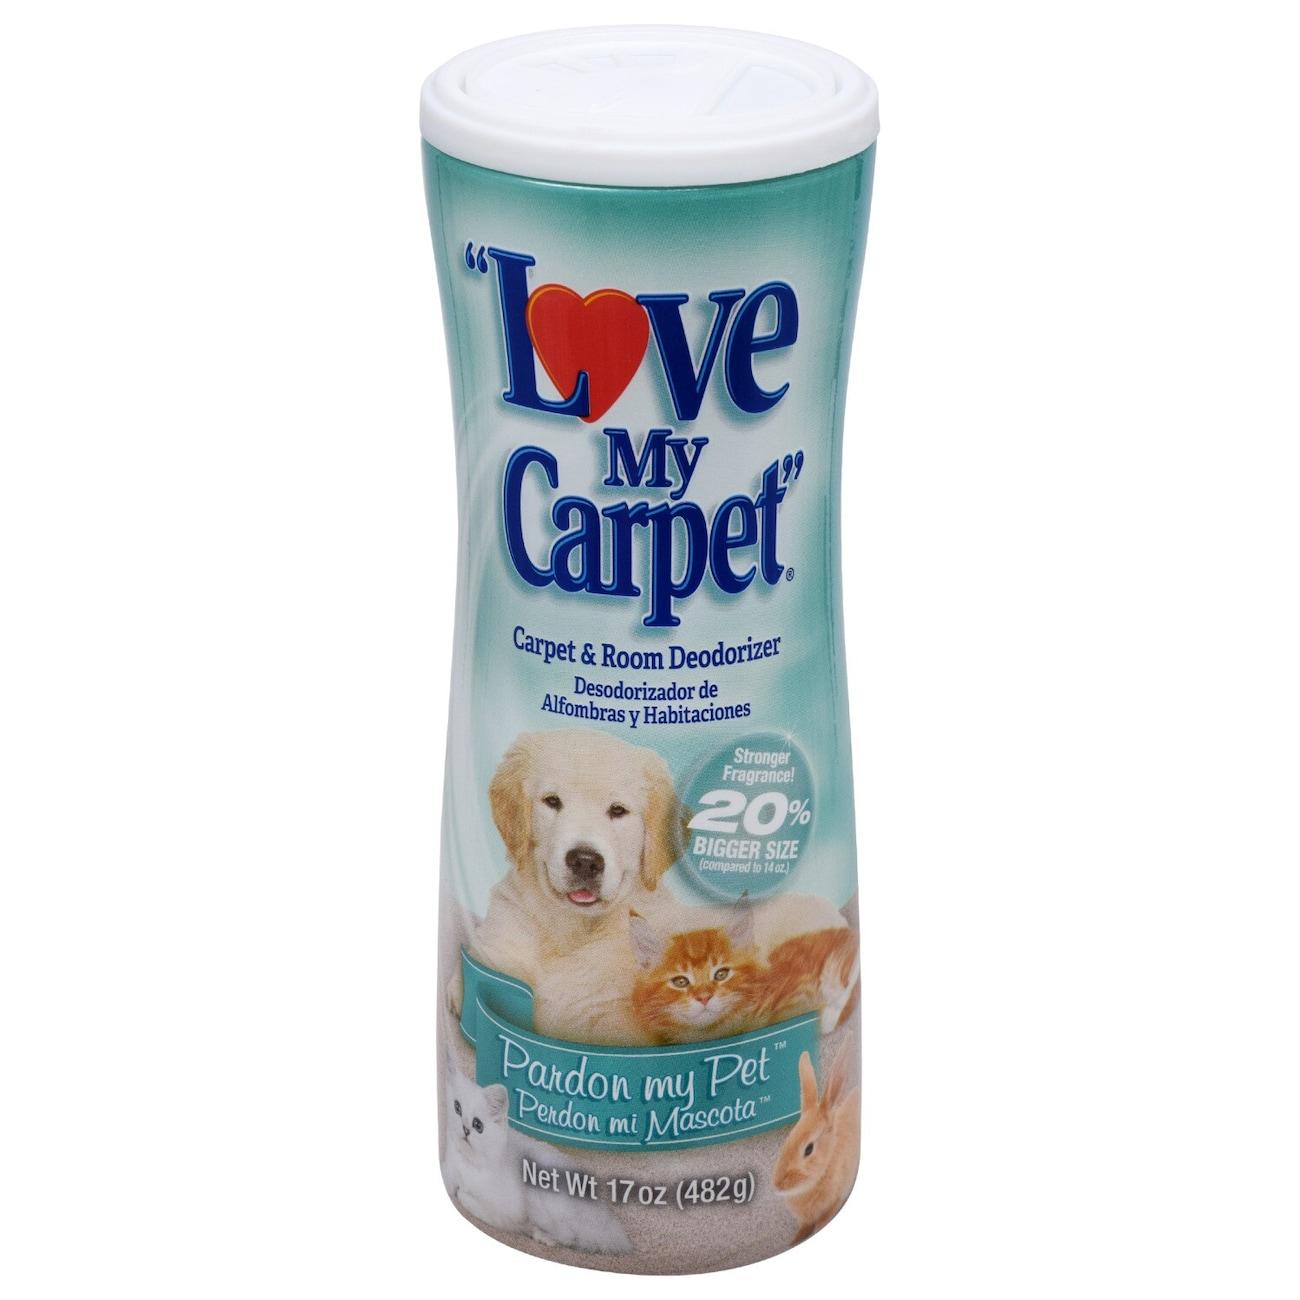 Love My Carpet Pardon My Pet 2 In 1 Carpet Room Deodorizer 17 Oz